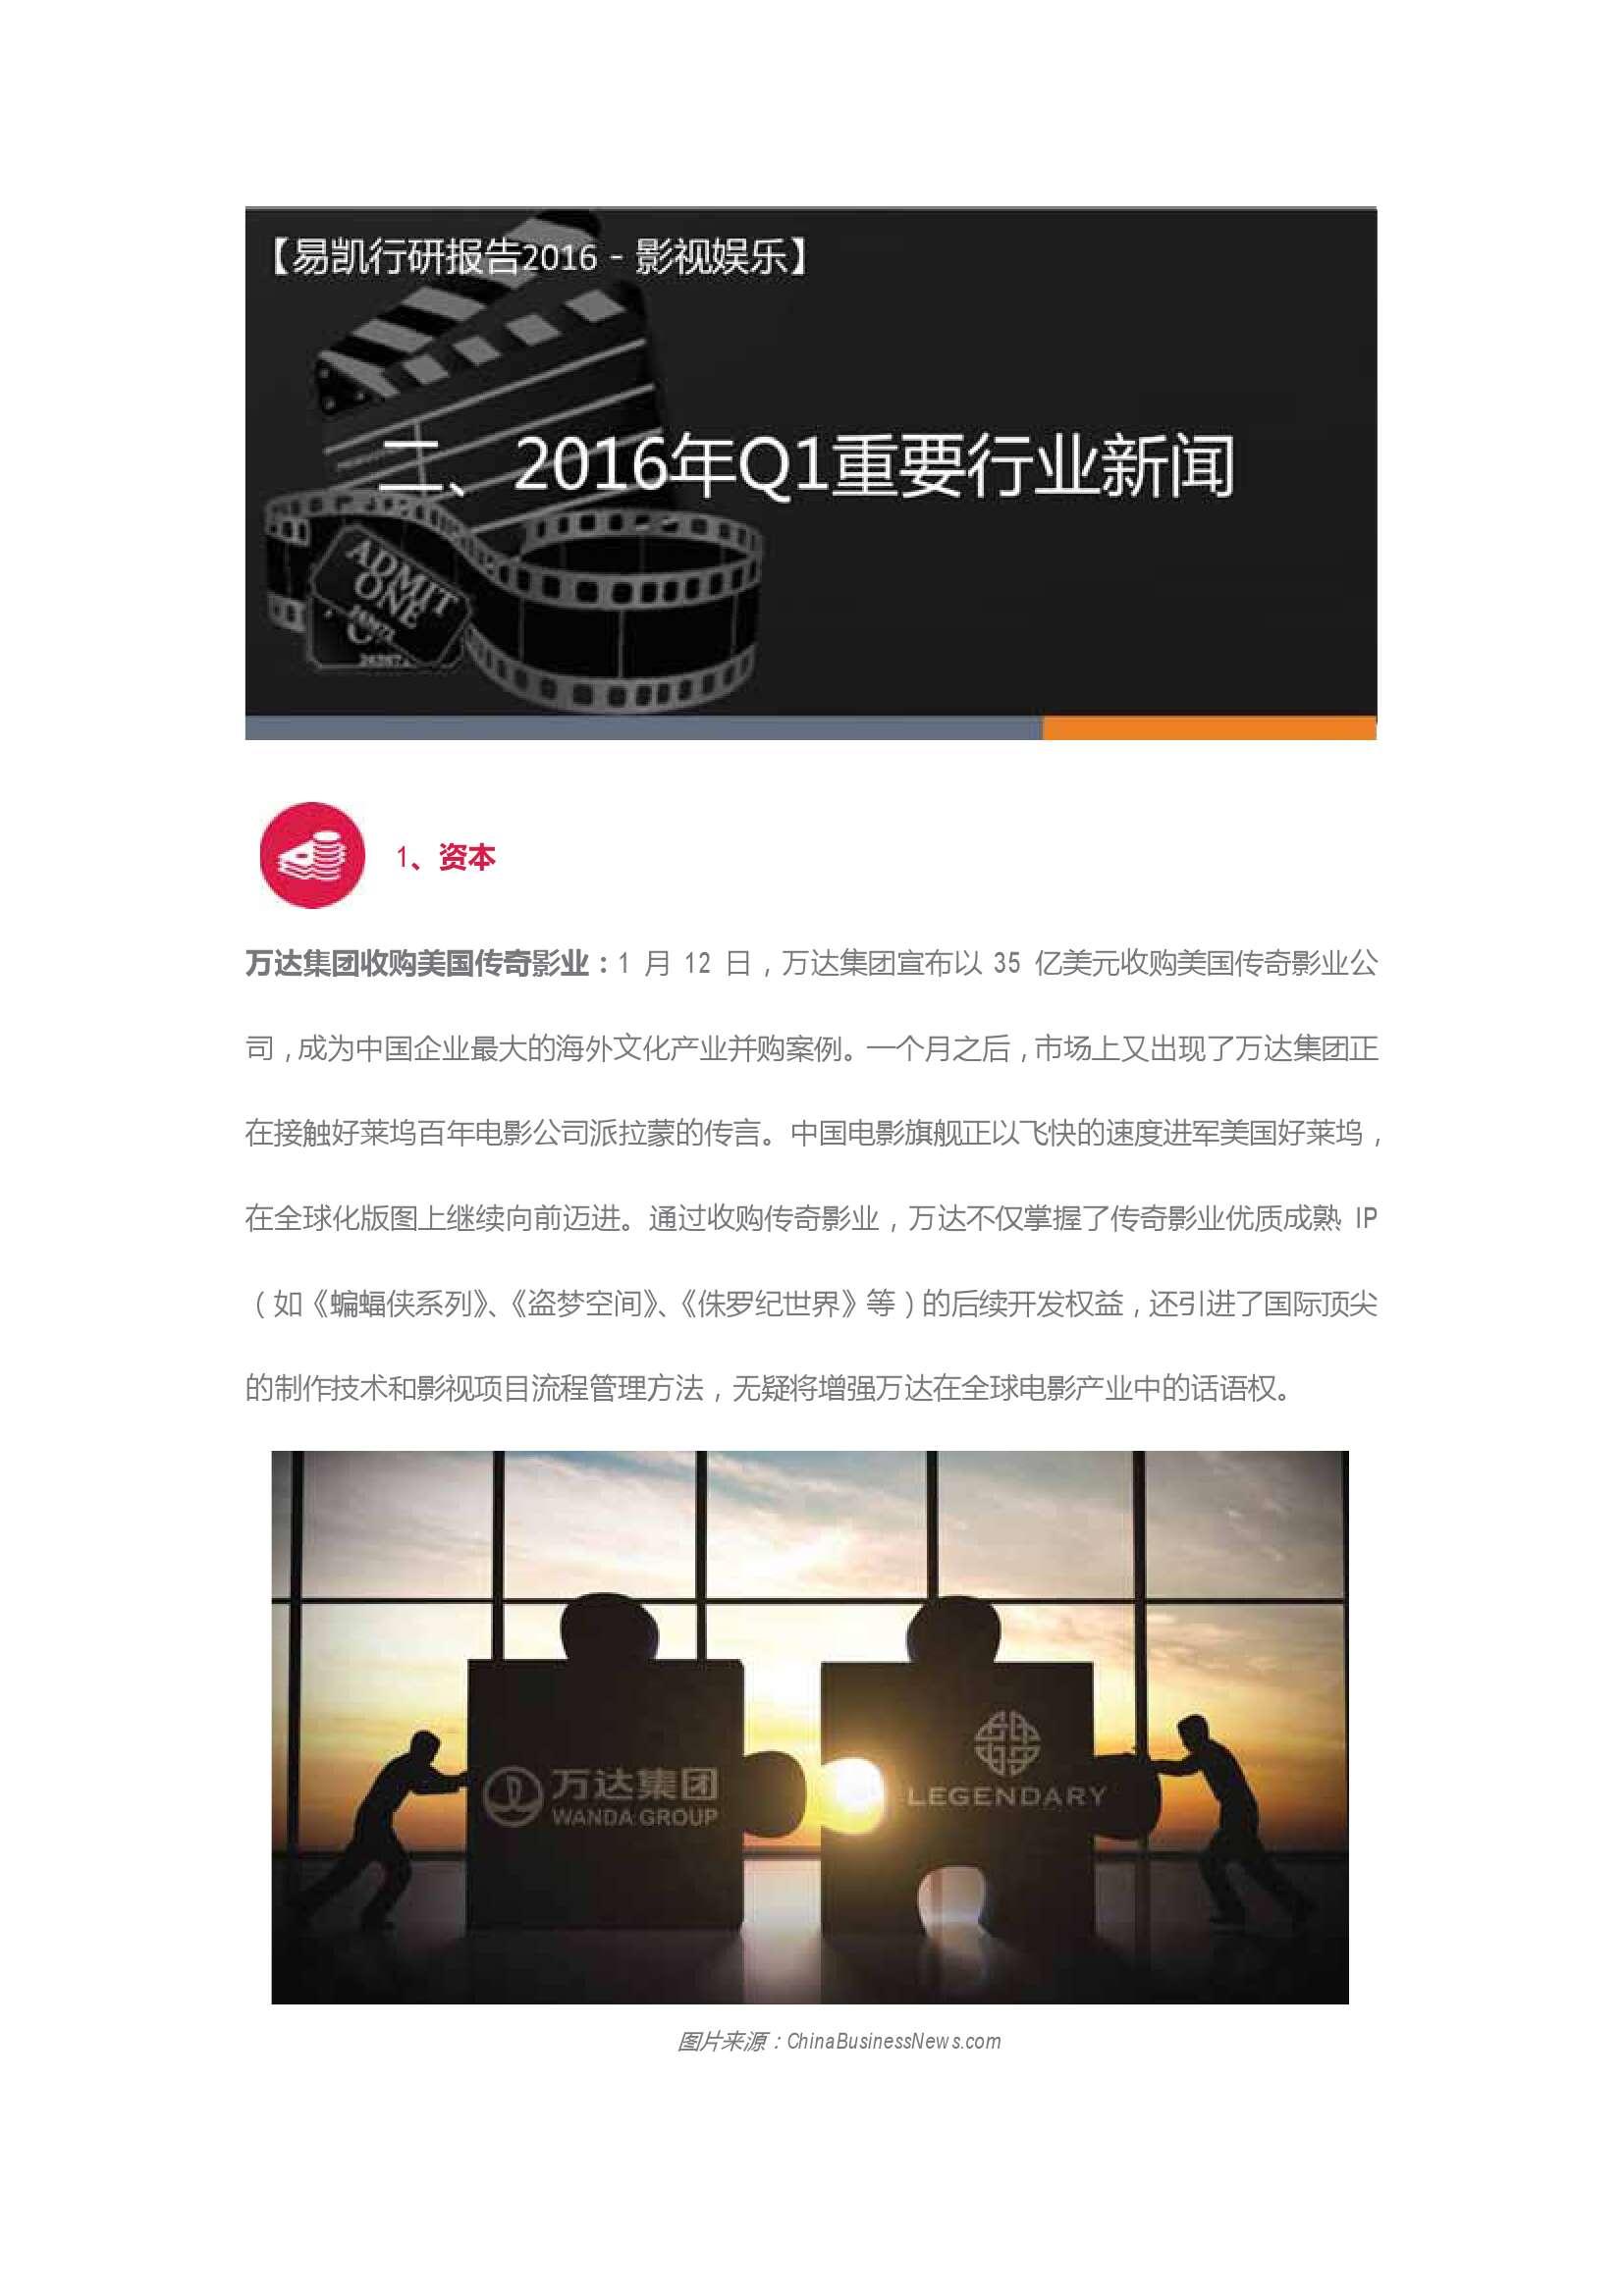 2016Q1中国娱乐产业季度观察_000005